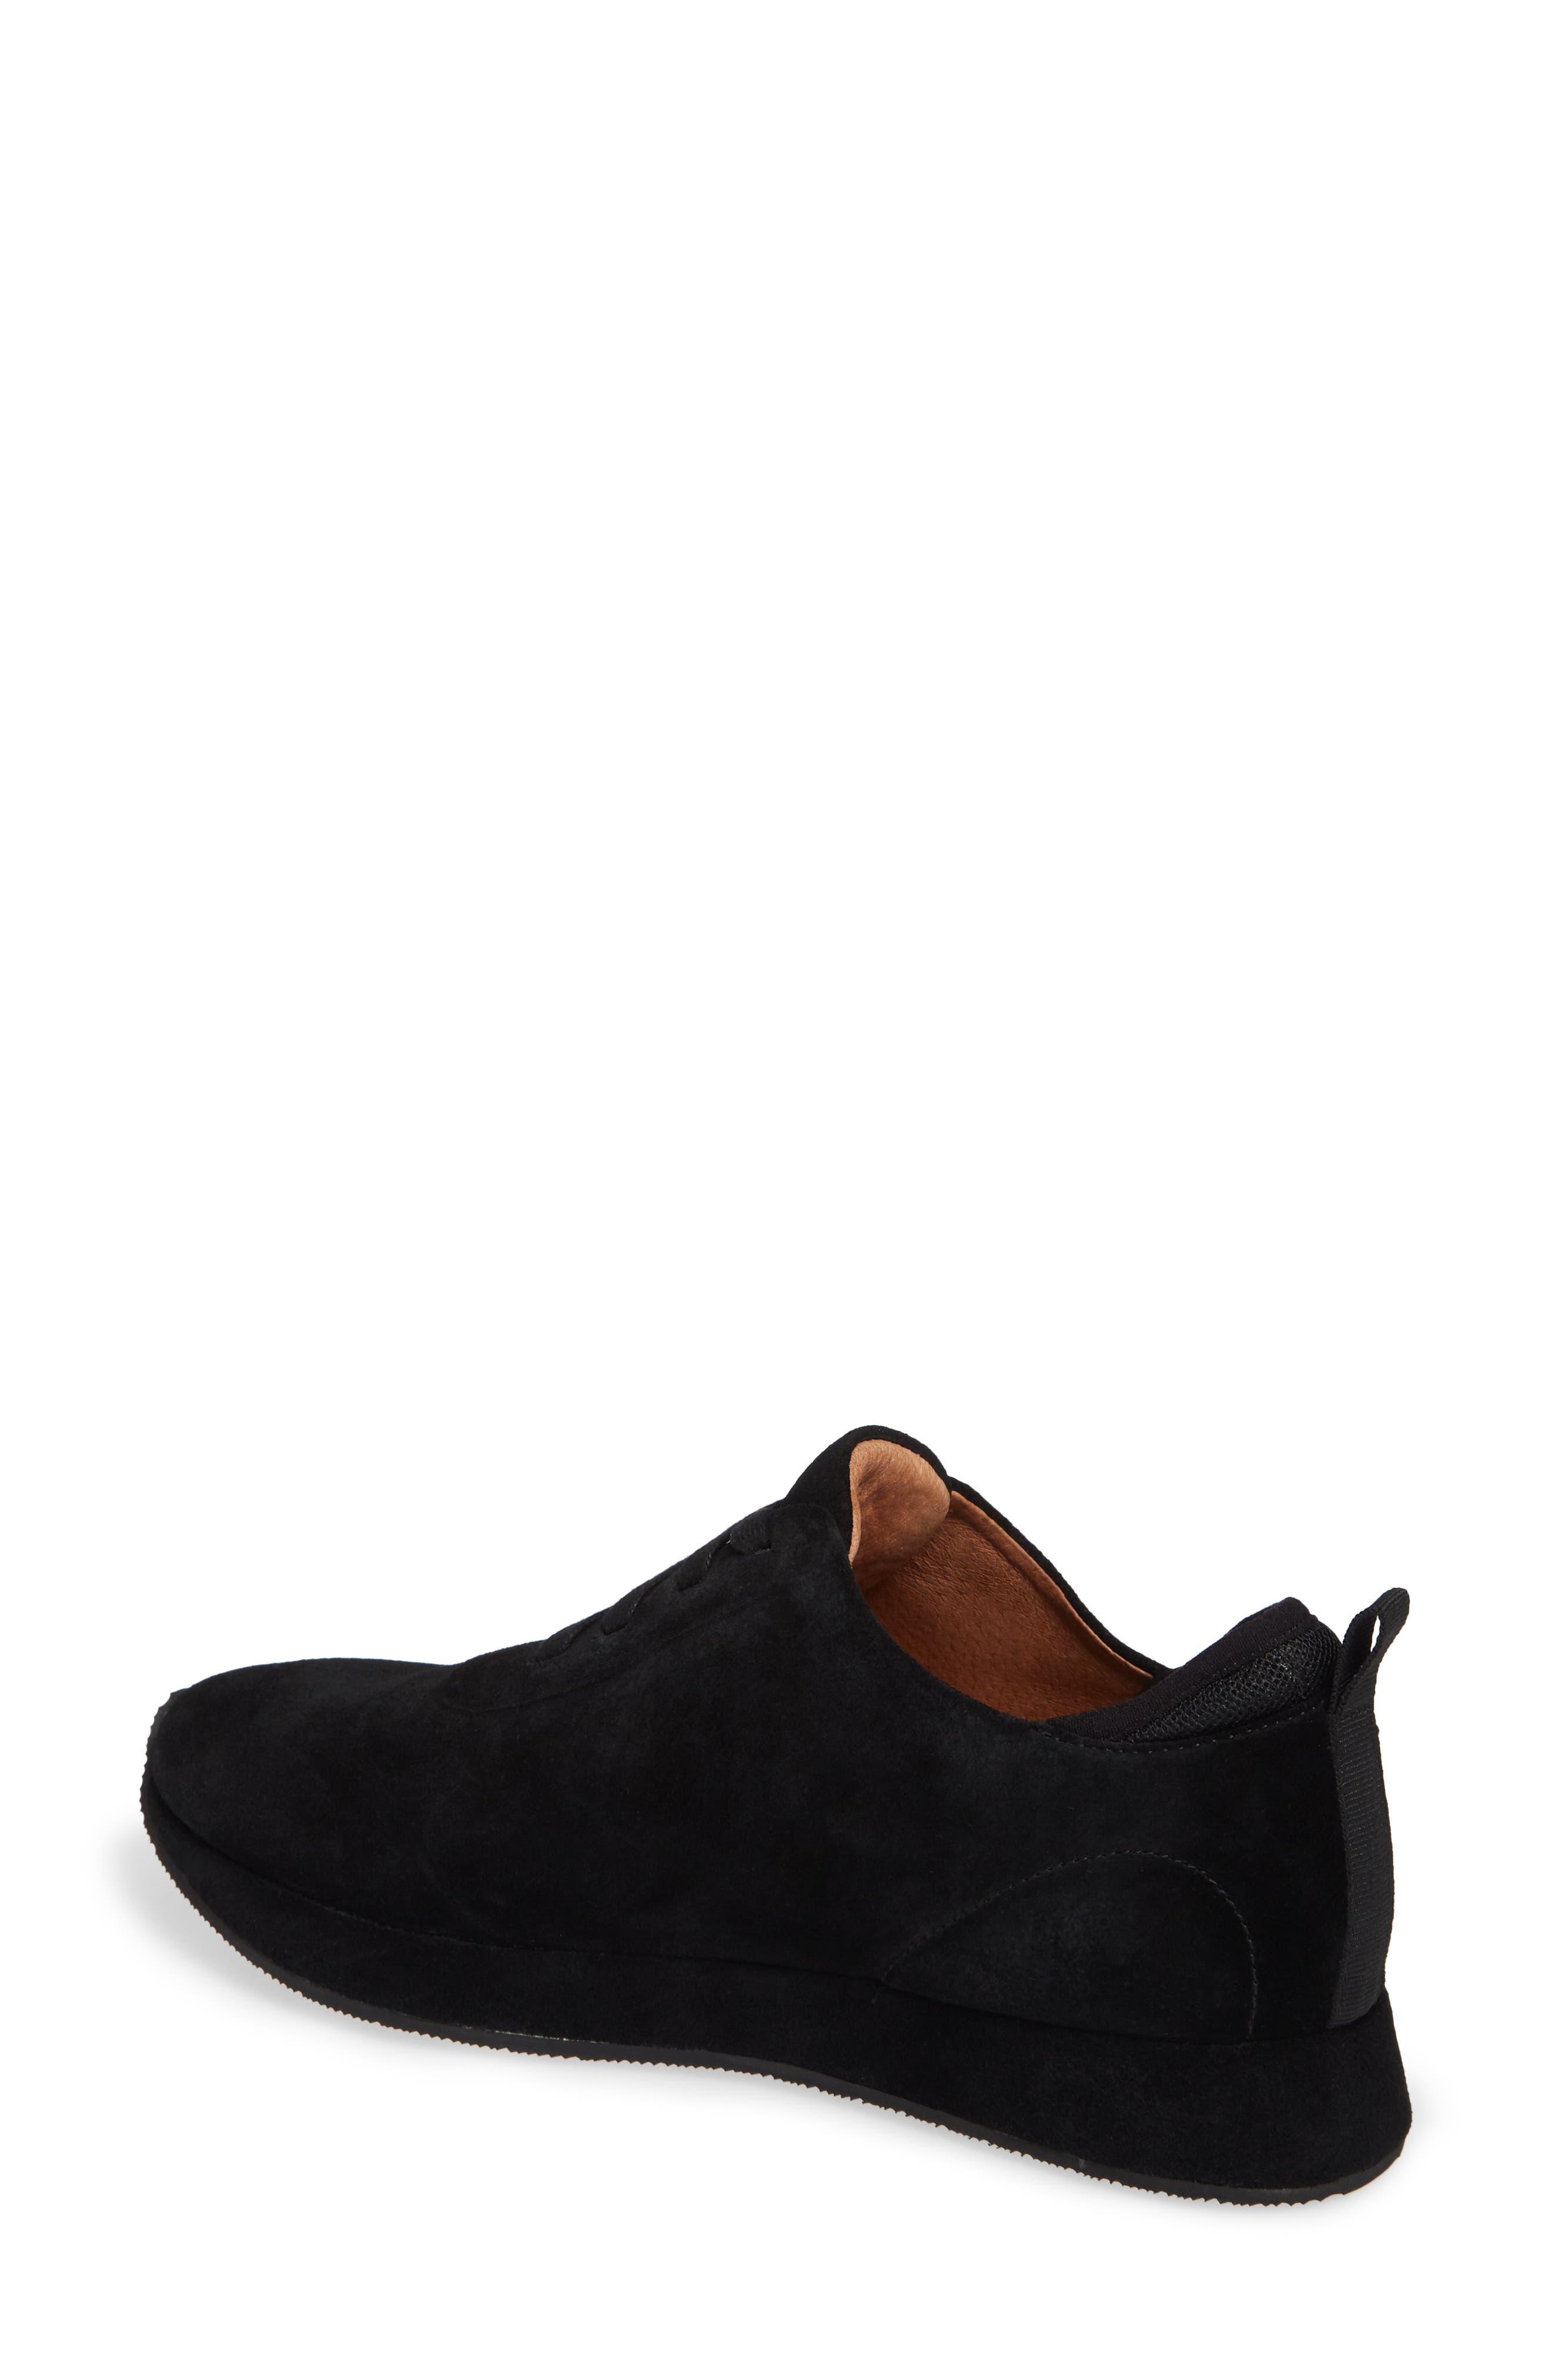 Mabel Sneaker,                             Alternate thumbnail 2, color,                             BLACK SUEDE